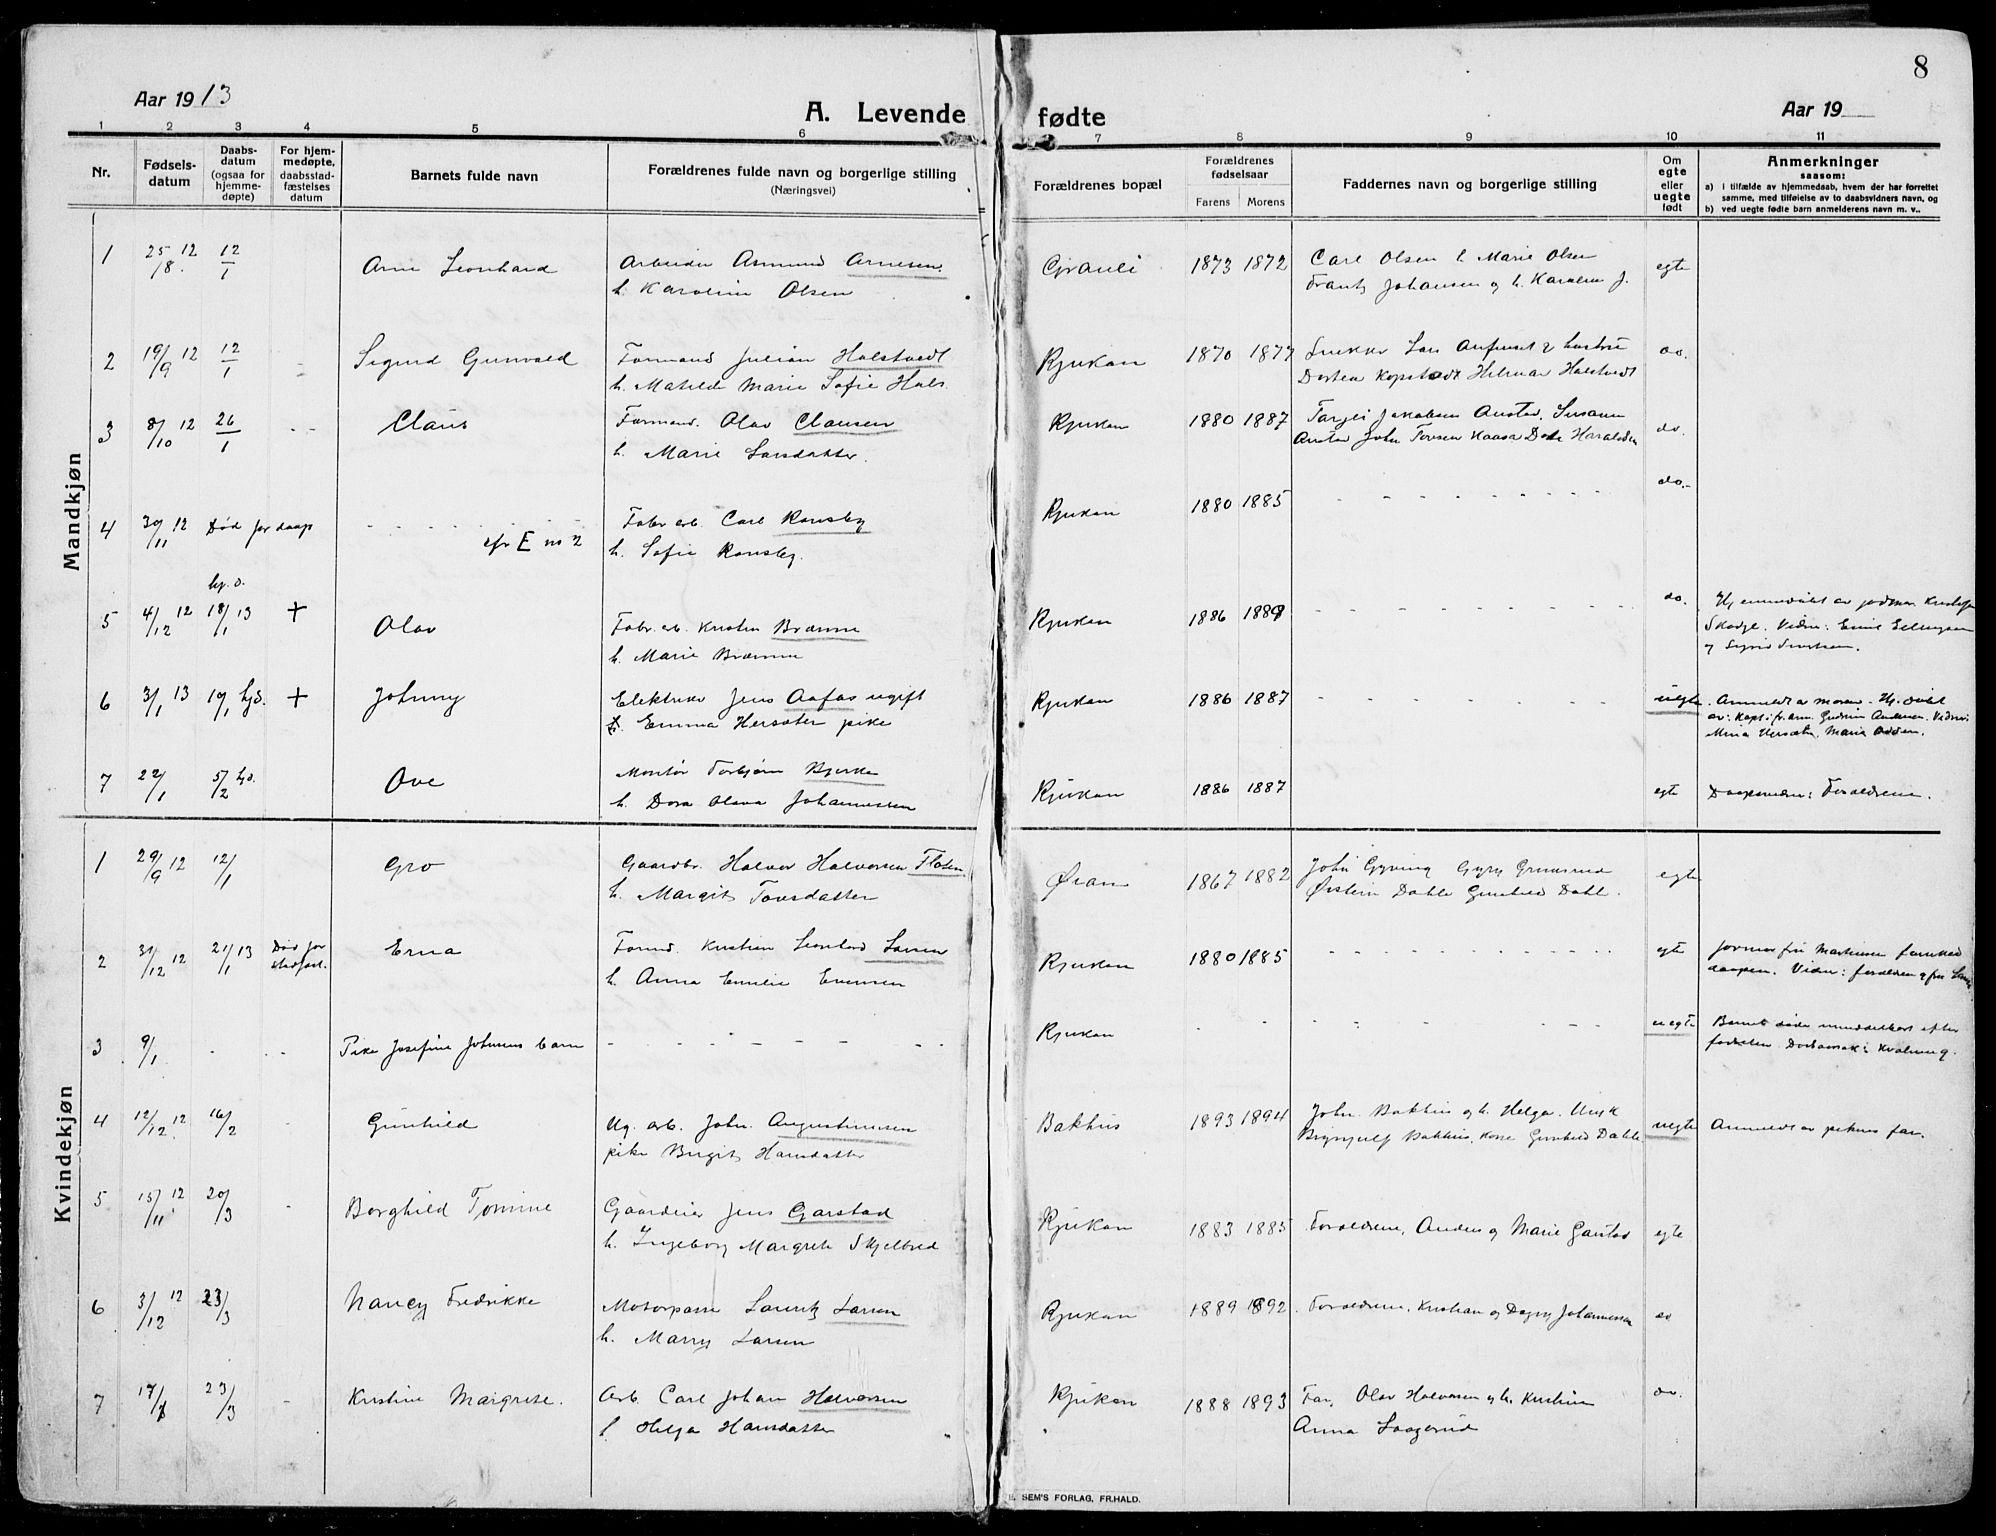 SAKO, Rjukan kirkebøker, F/Fa/L0002: Ministerialbok nr. 2, 1912-1917, s. 8